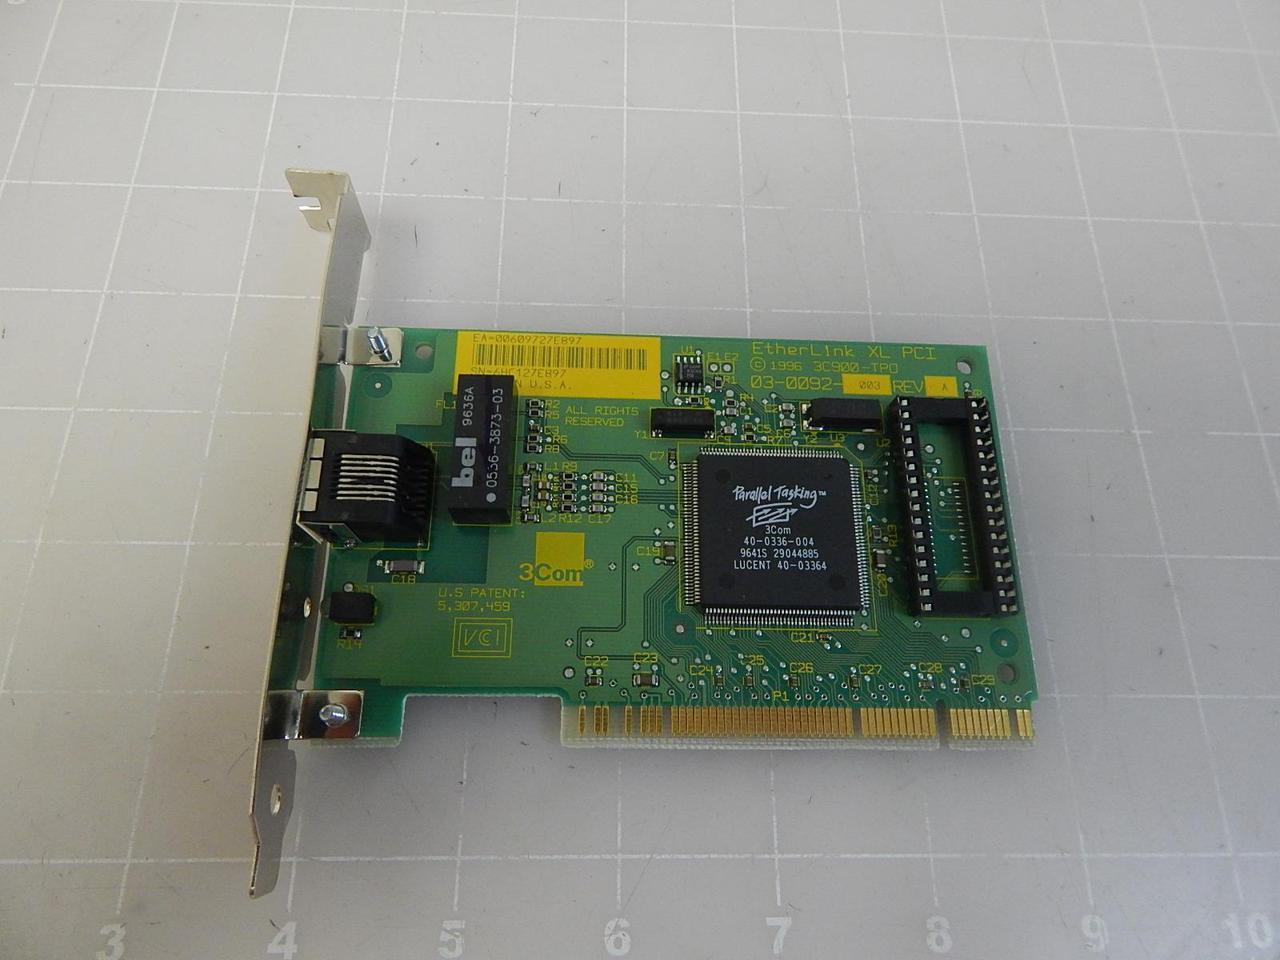 3C900 ETHERLINK XL PCI DRIVER